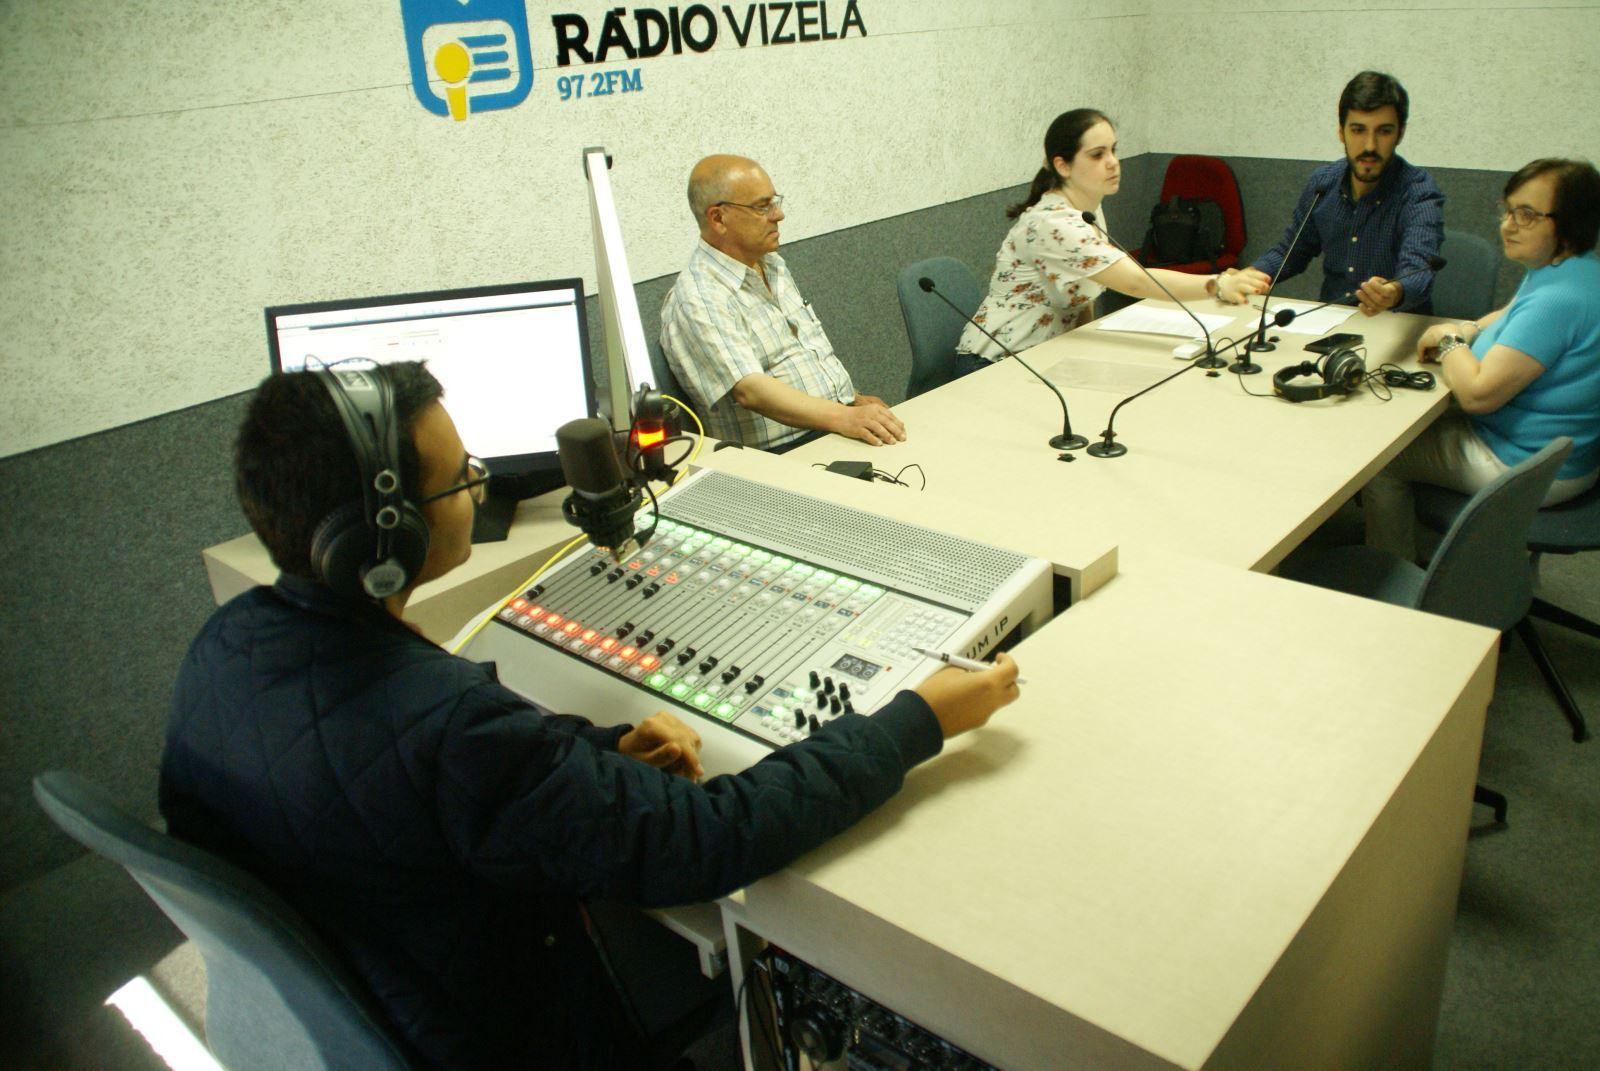 Vizela | Misericórdia na frequência 97.2 FM